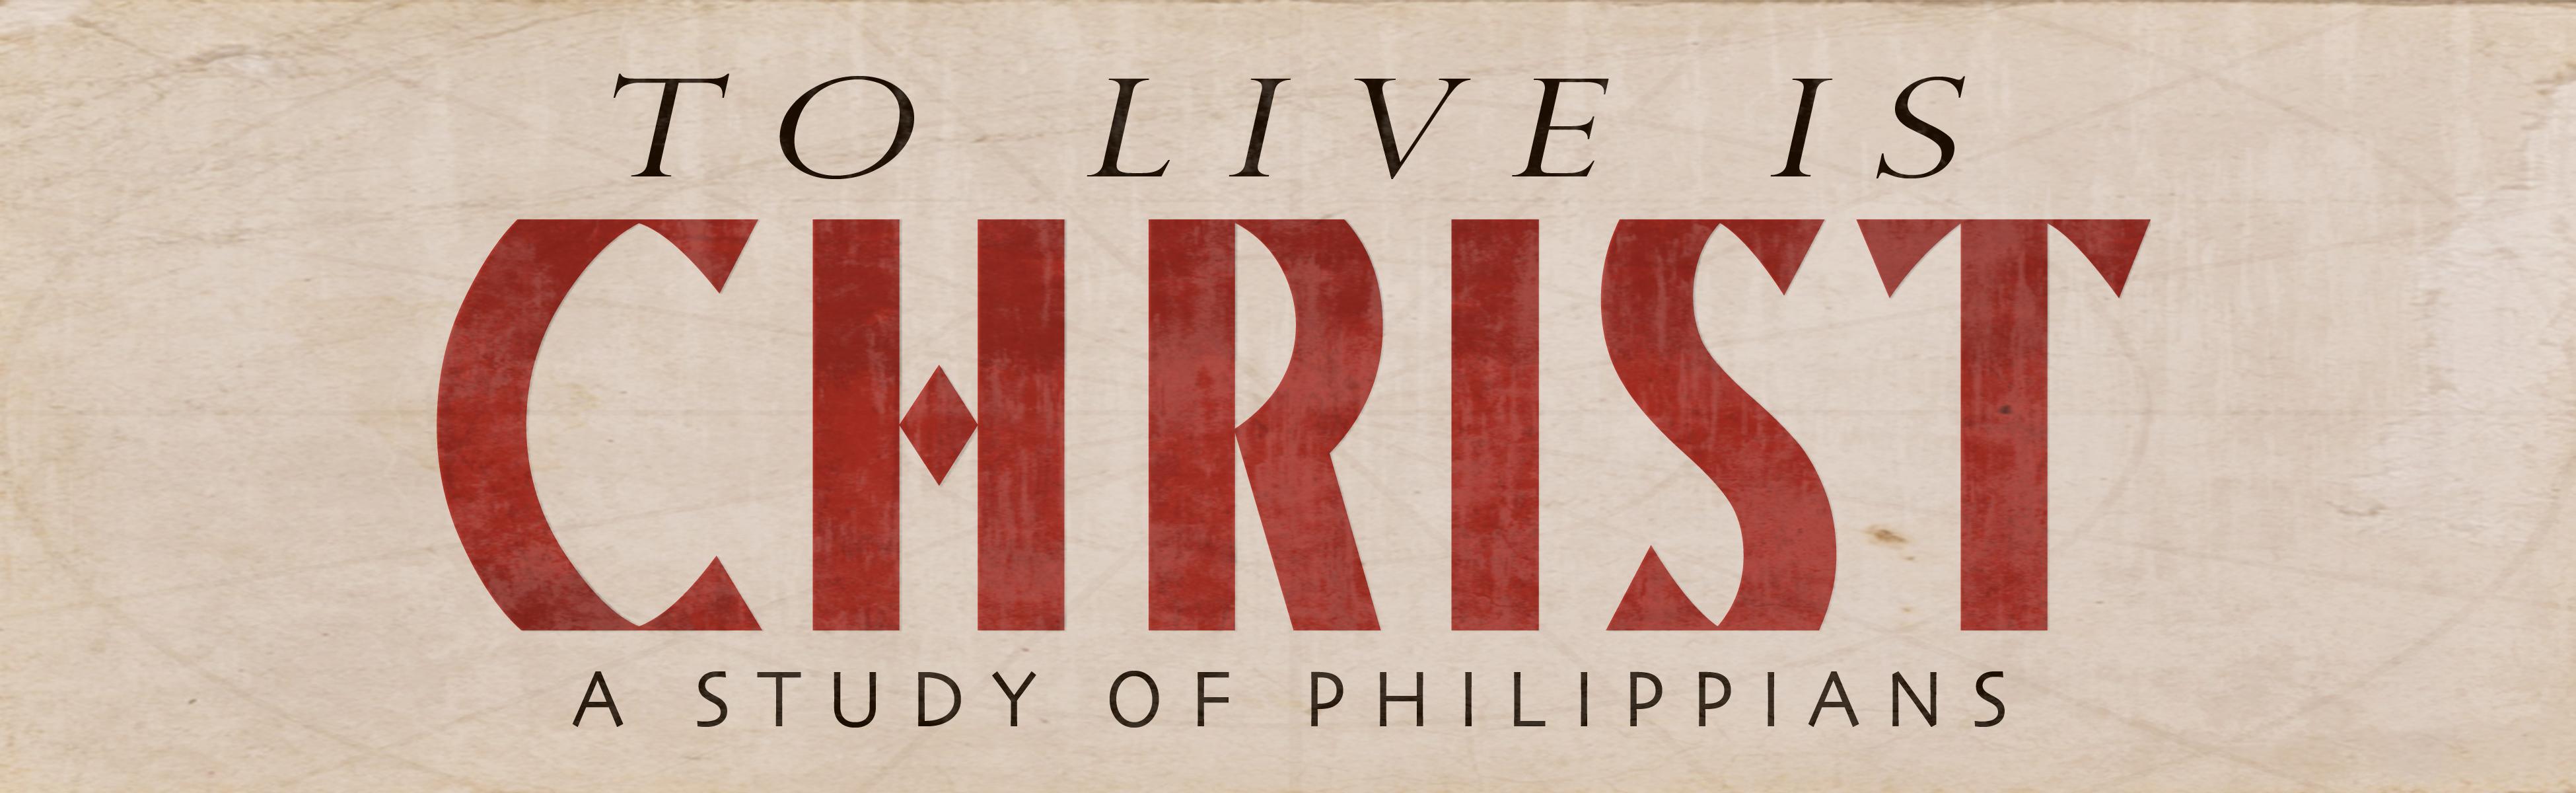 Philippians_13x4_final.jpg